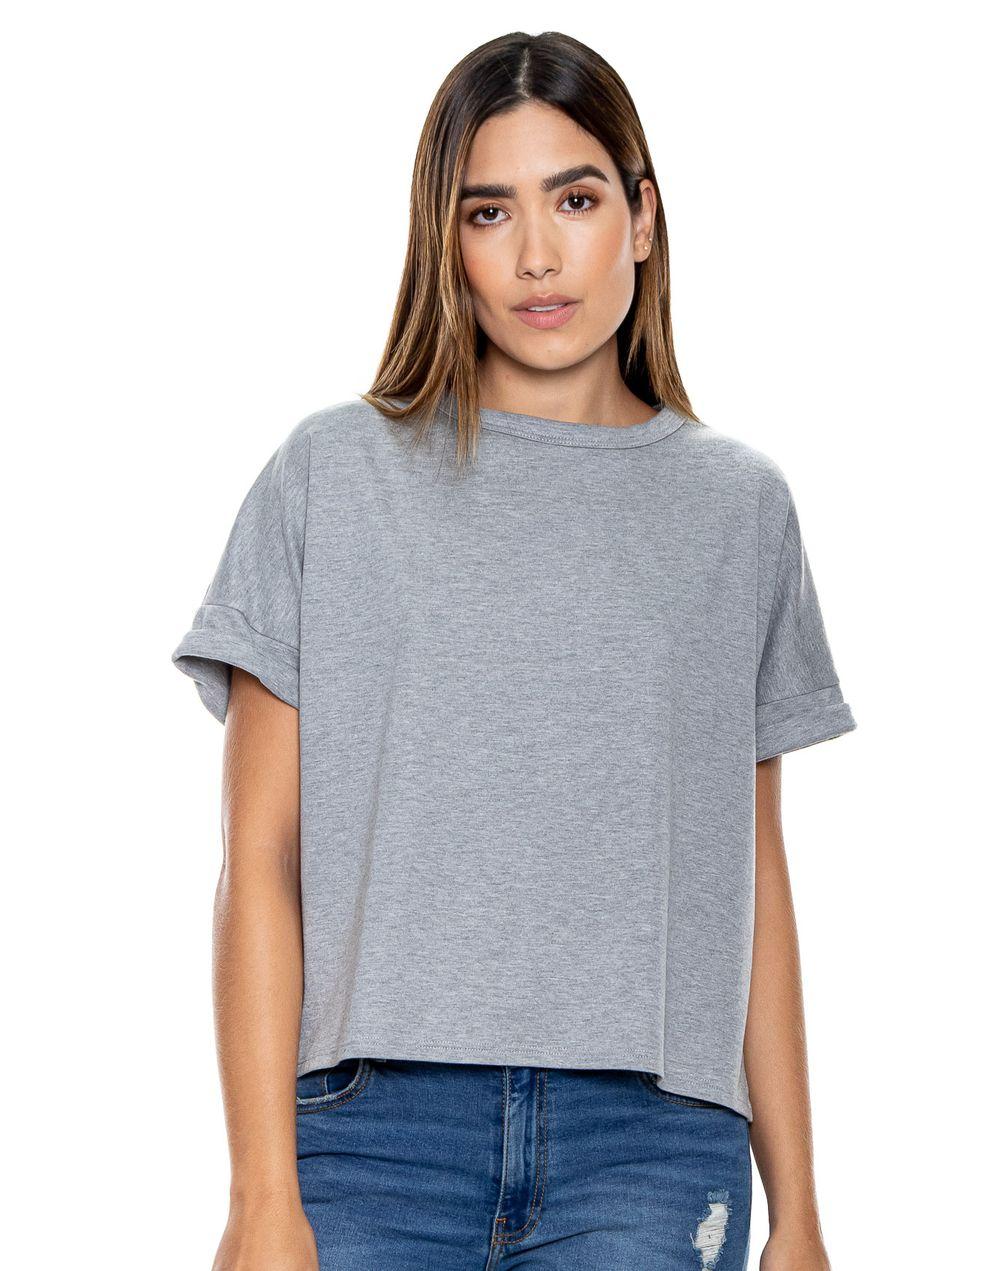 camiseta-114303-gris-2.jpg